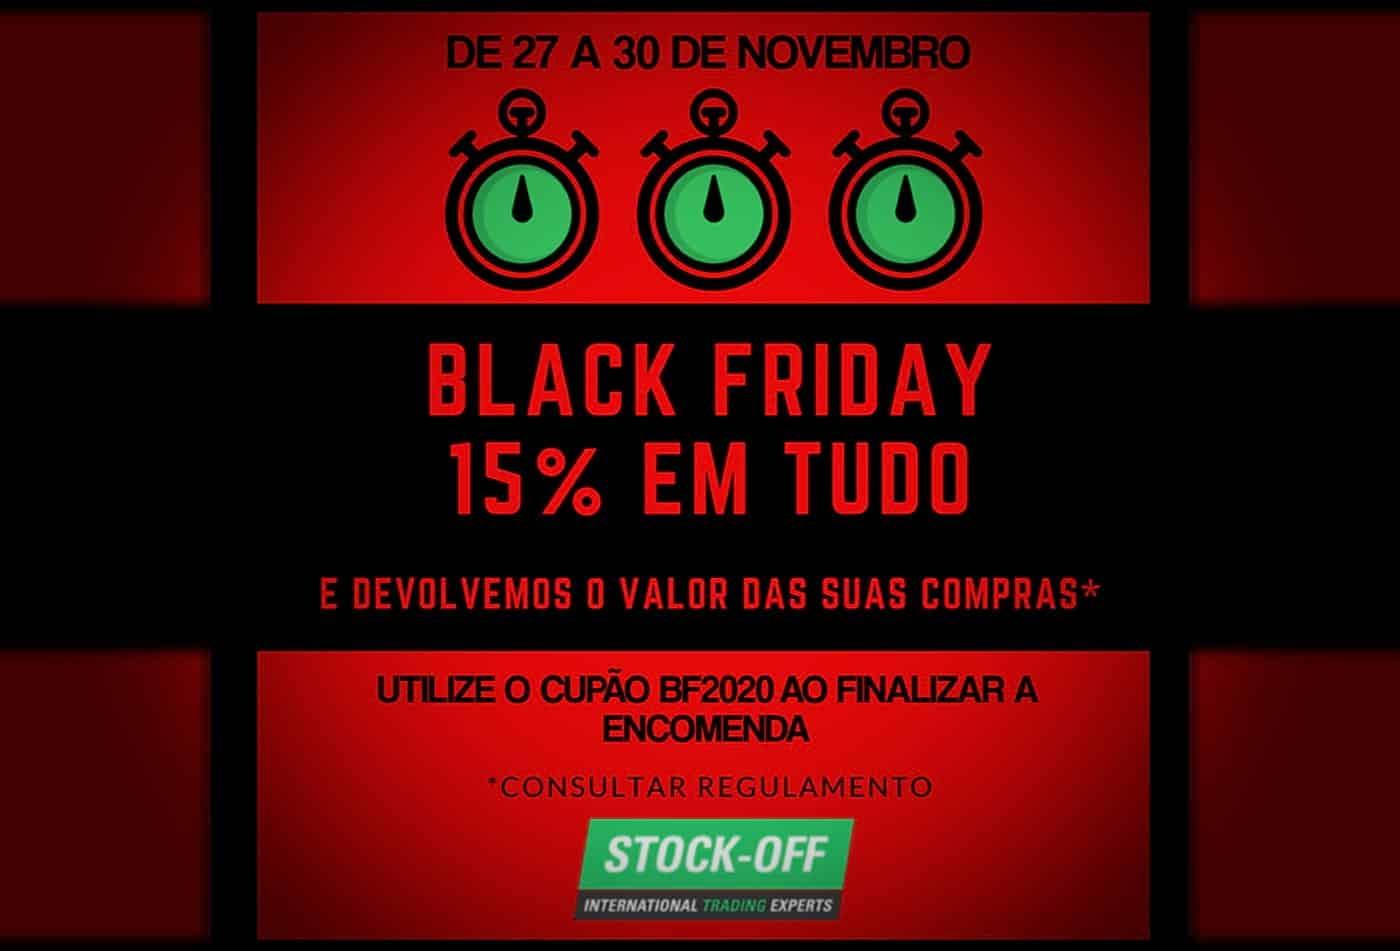 Stock-Off - Black Friday